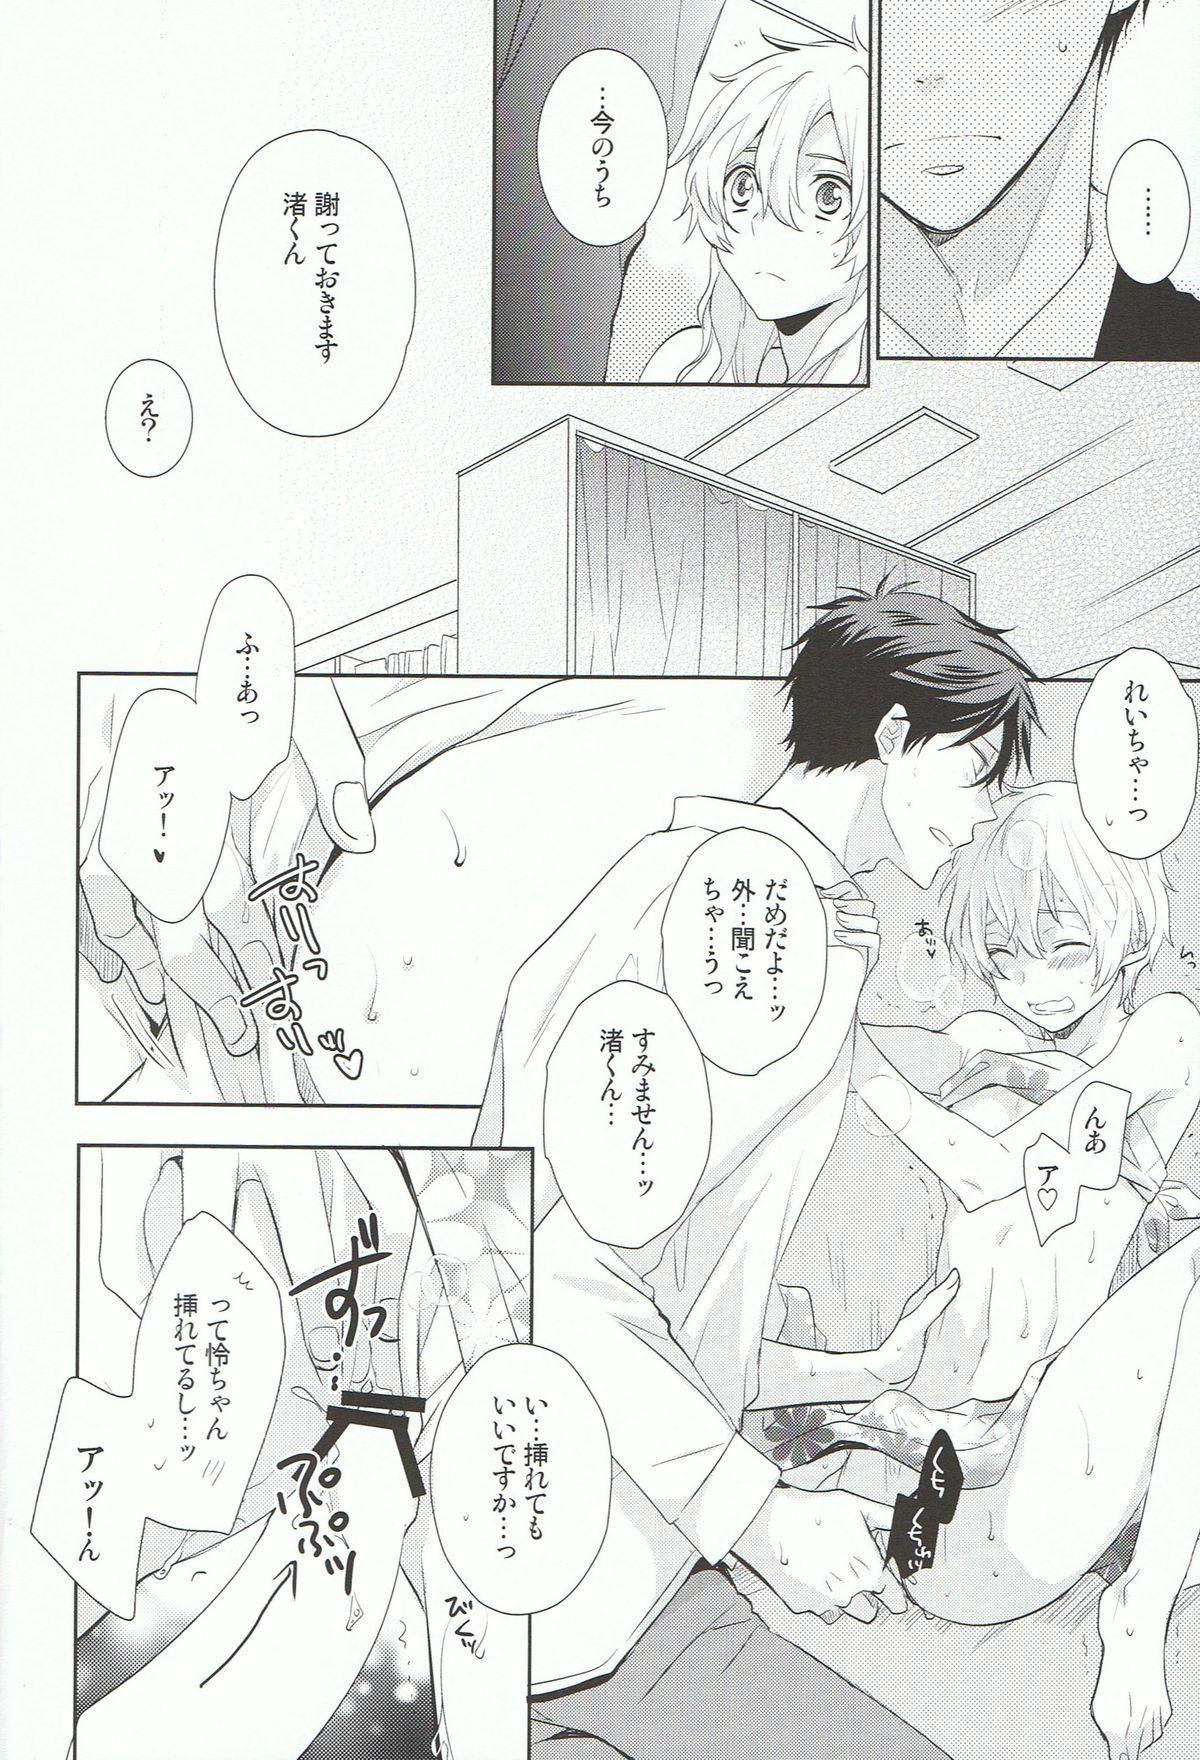 Nagisa-kun de ii deshou! 16